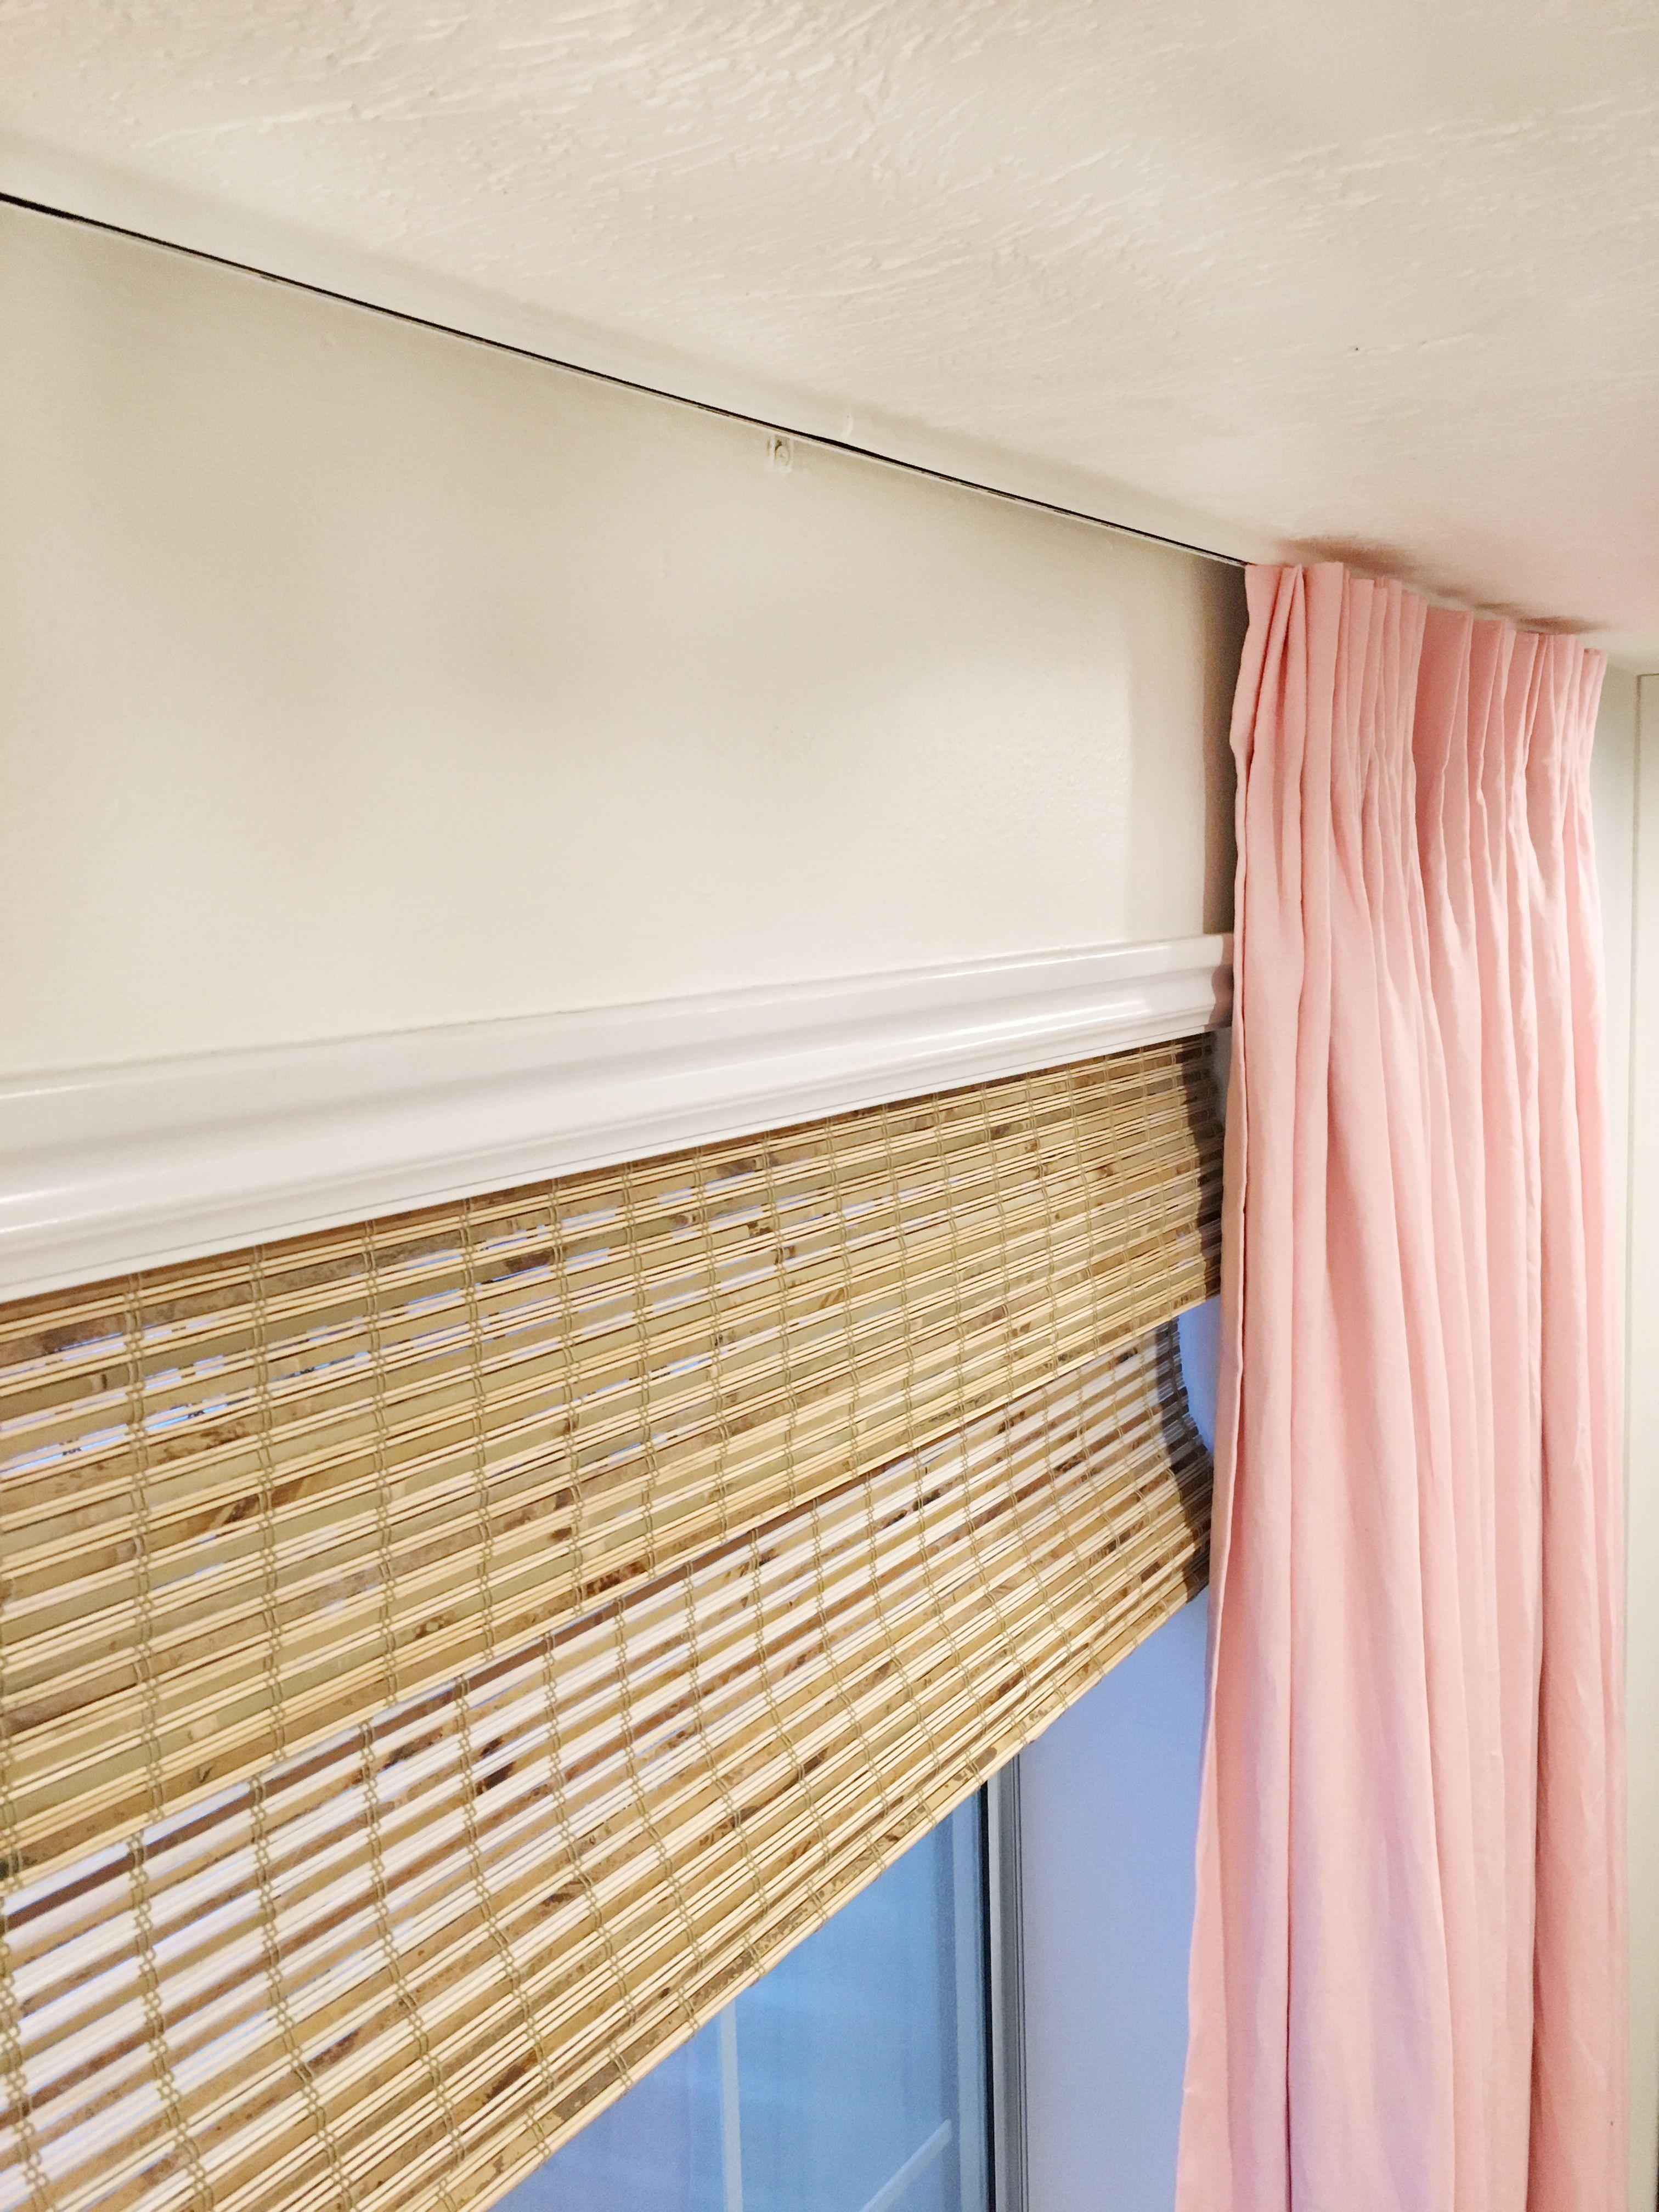 A Ceiling Mount Curtain Rod